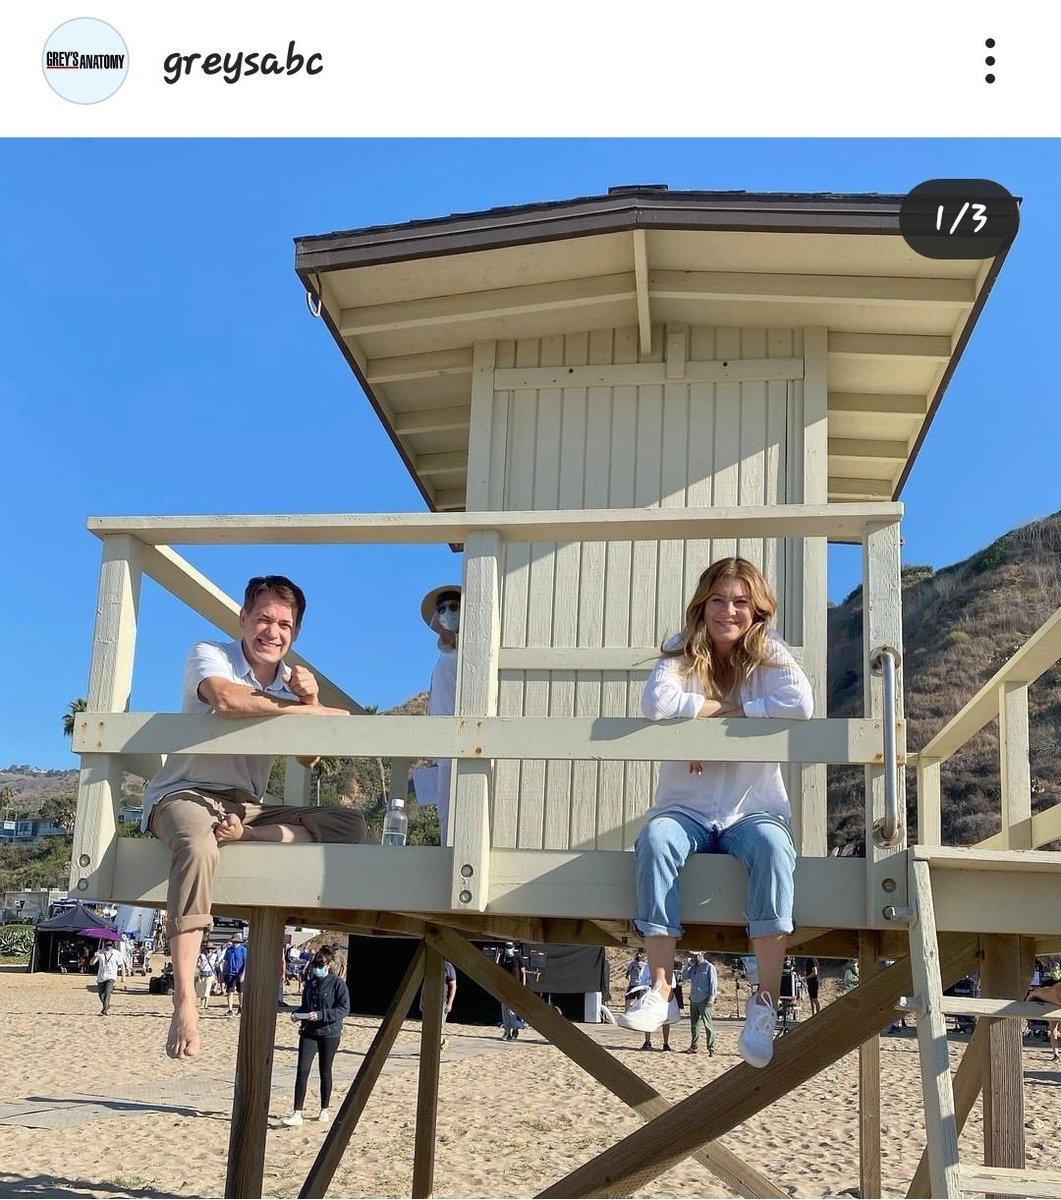 Será que meu coração vai aguentar essa temporada, depois de #Derek teremos #georgeomalley #George. #MeredithGrey #GreysAnatomy #Meredith queremos #Lexie #MarkSloan